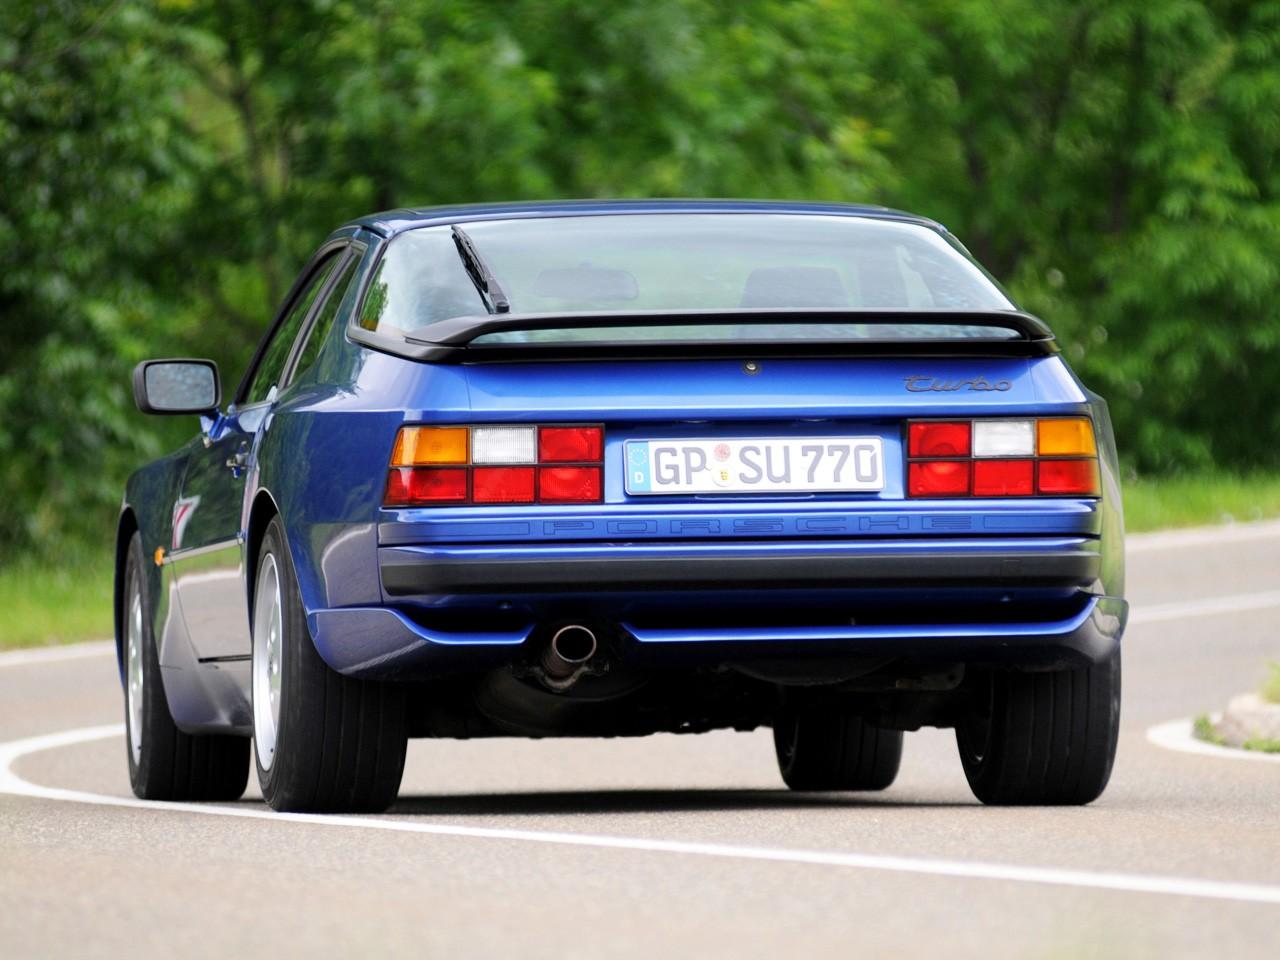 PORSCHE 944 TurboTurbo S 951 1985 1986 1987 1988